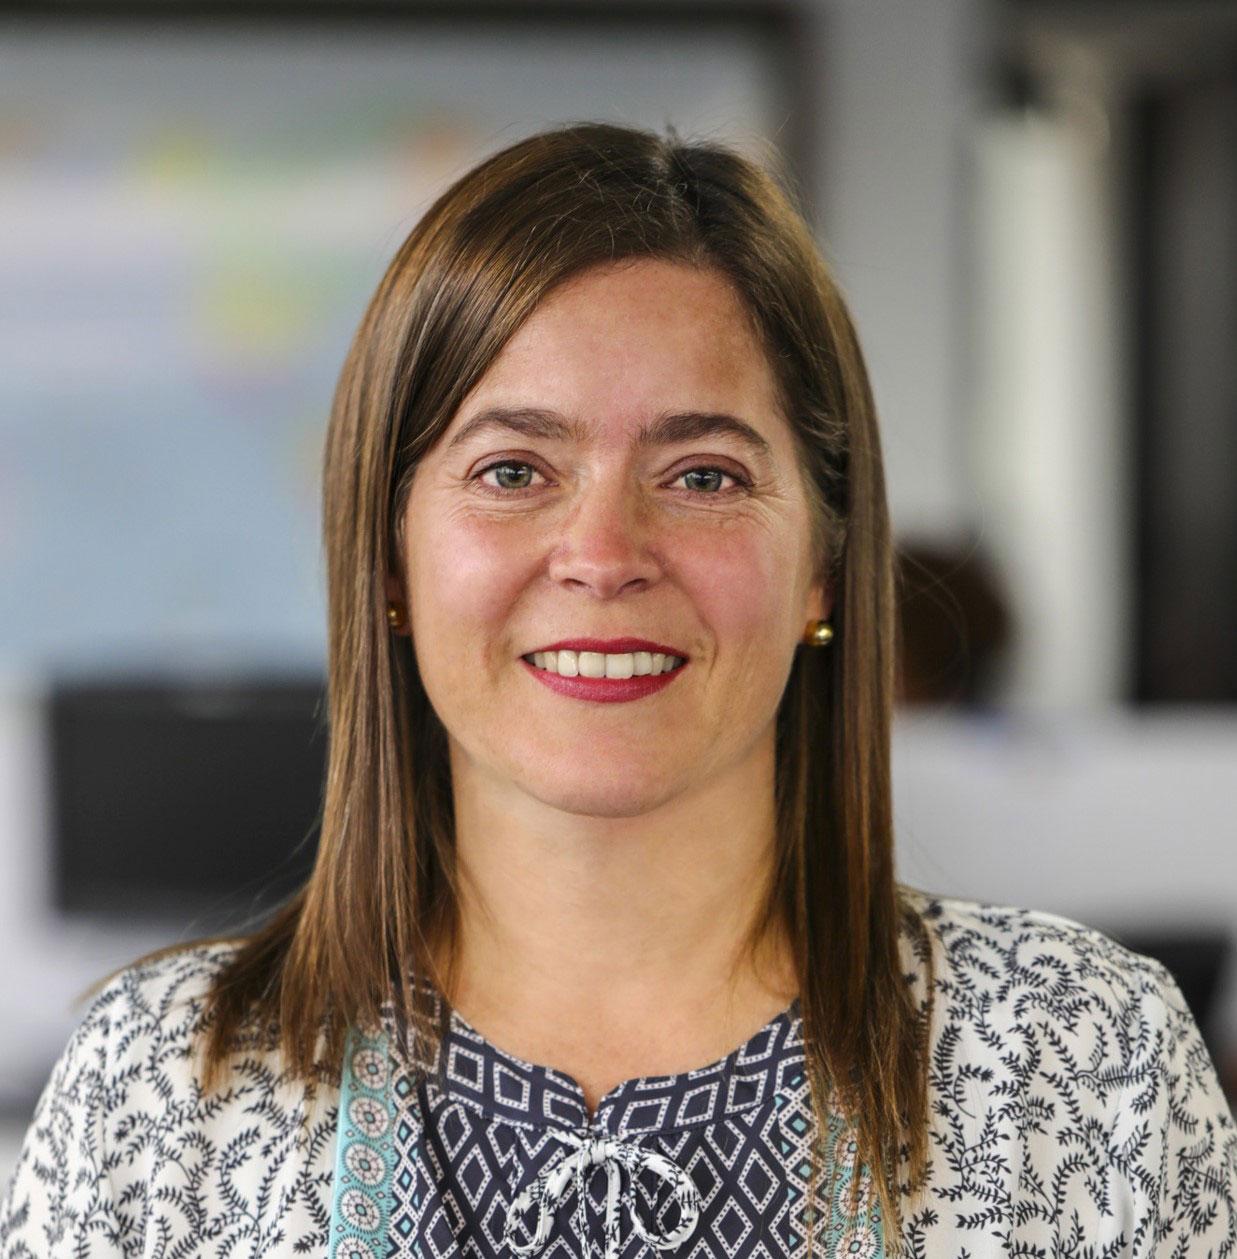 Isabel Sanín Llano